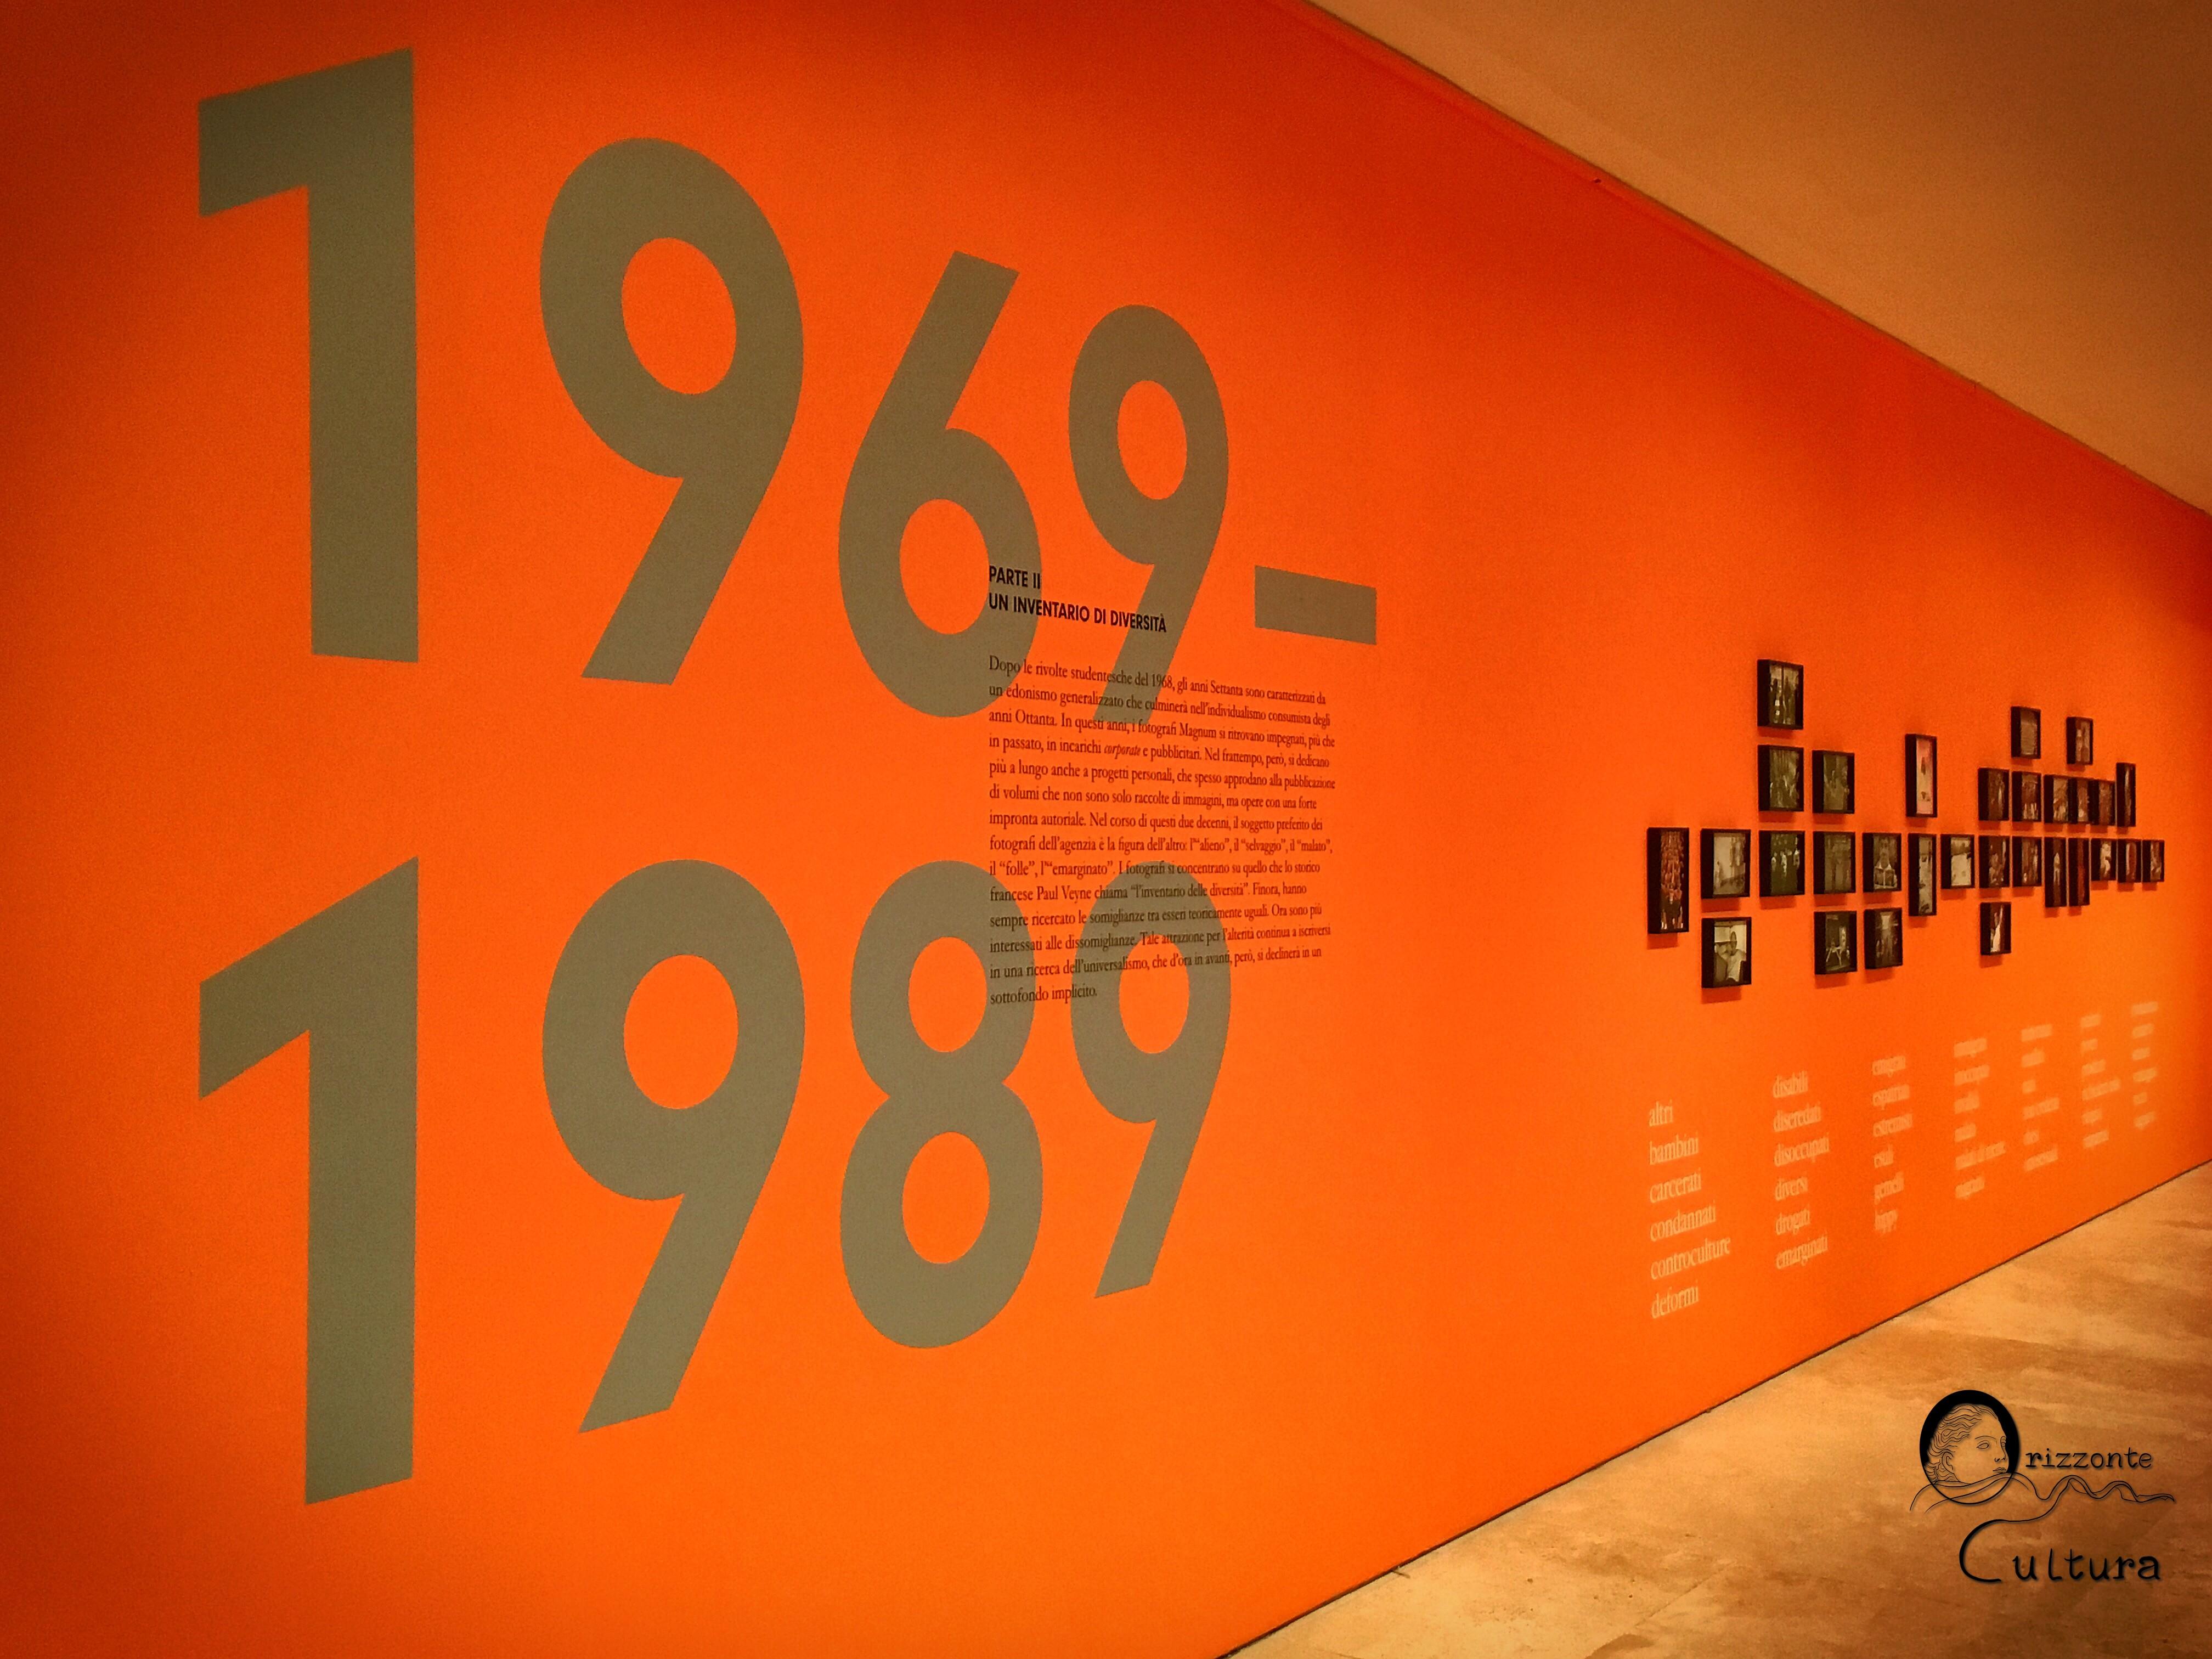 Magnum Manifesto, Museo dell'Ara Pacis - Orizzonte Cultura (ph. I.M. Melis)